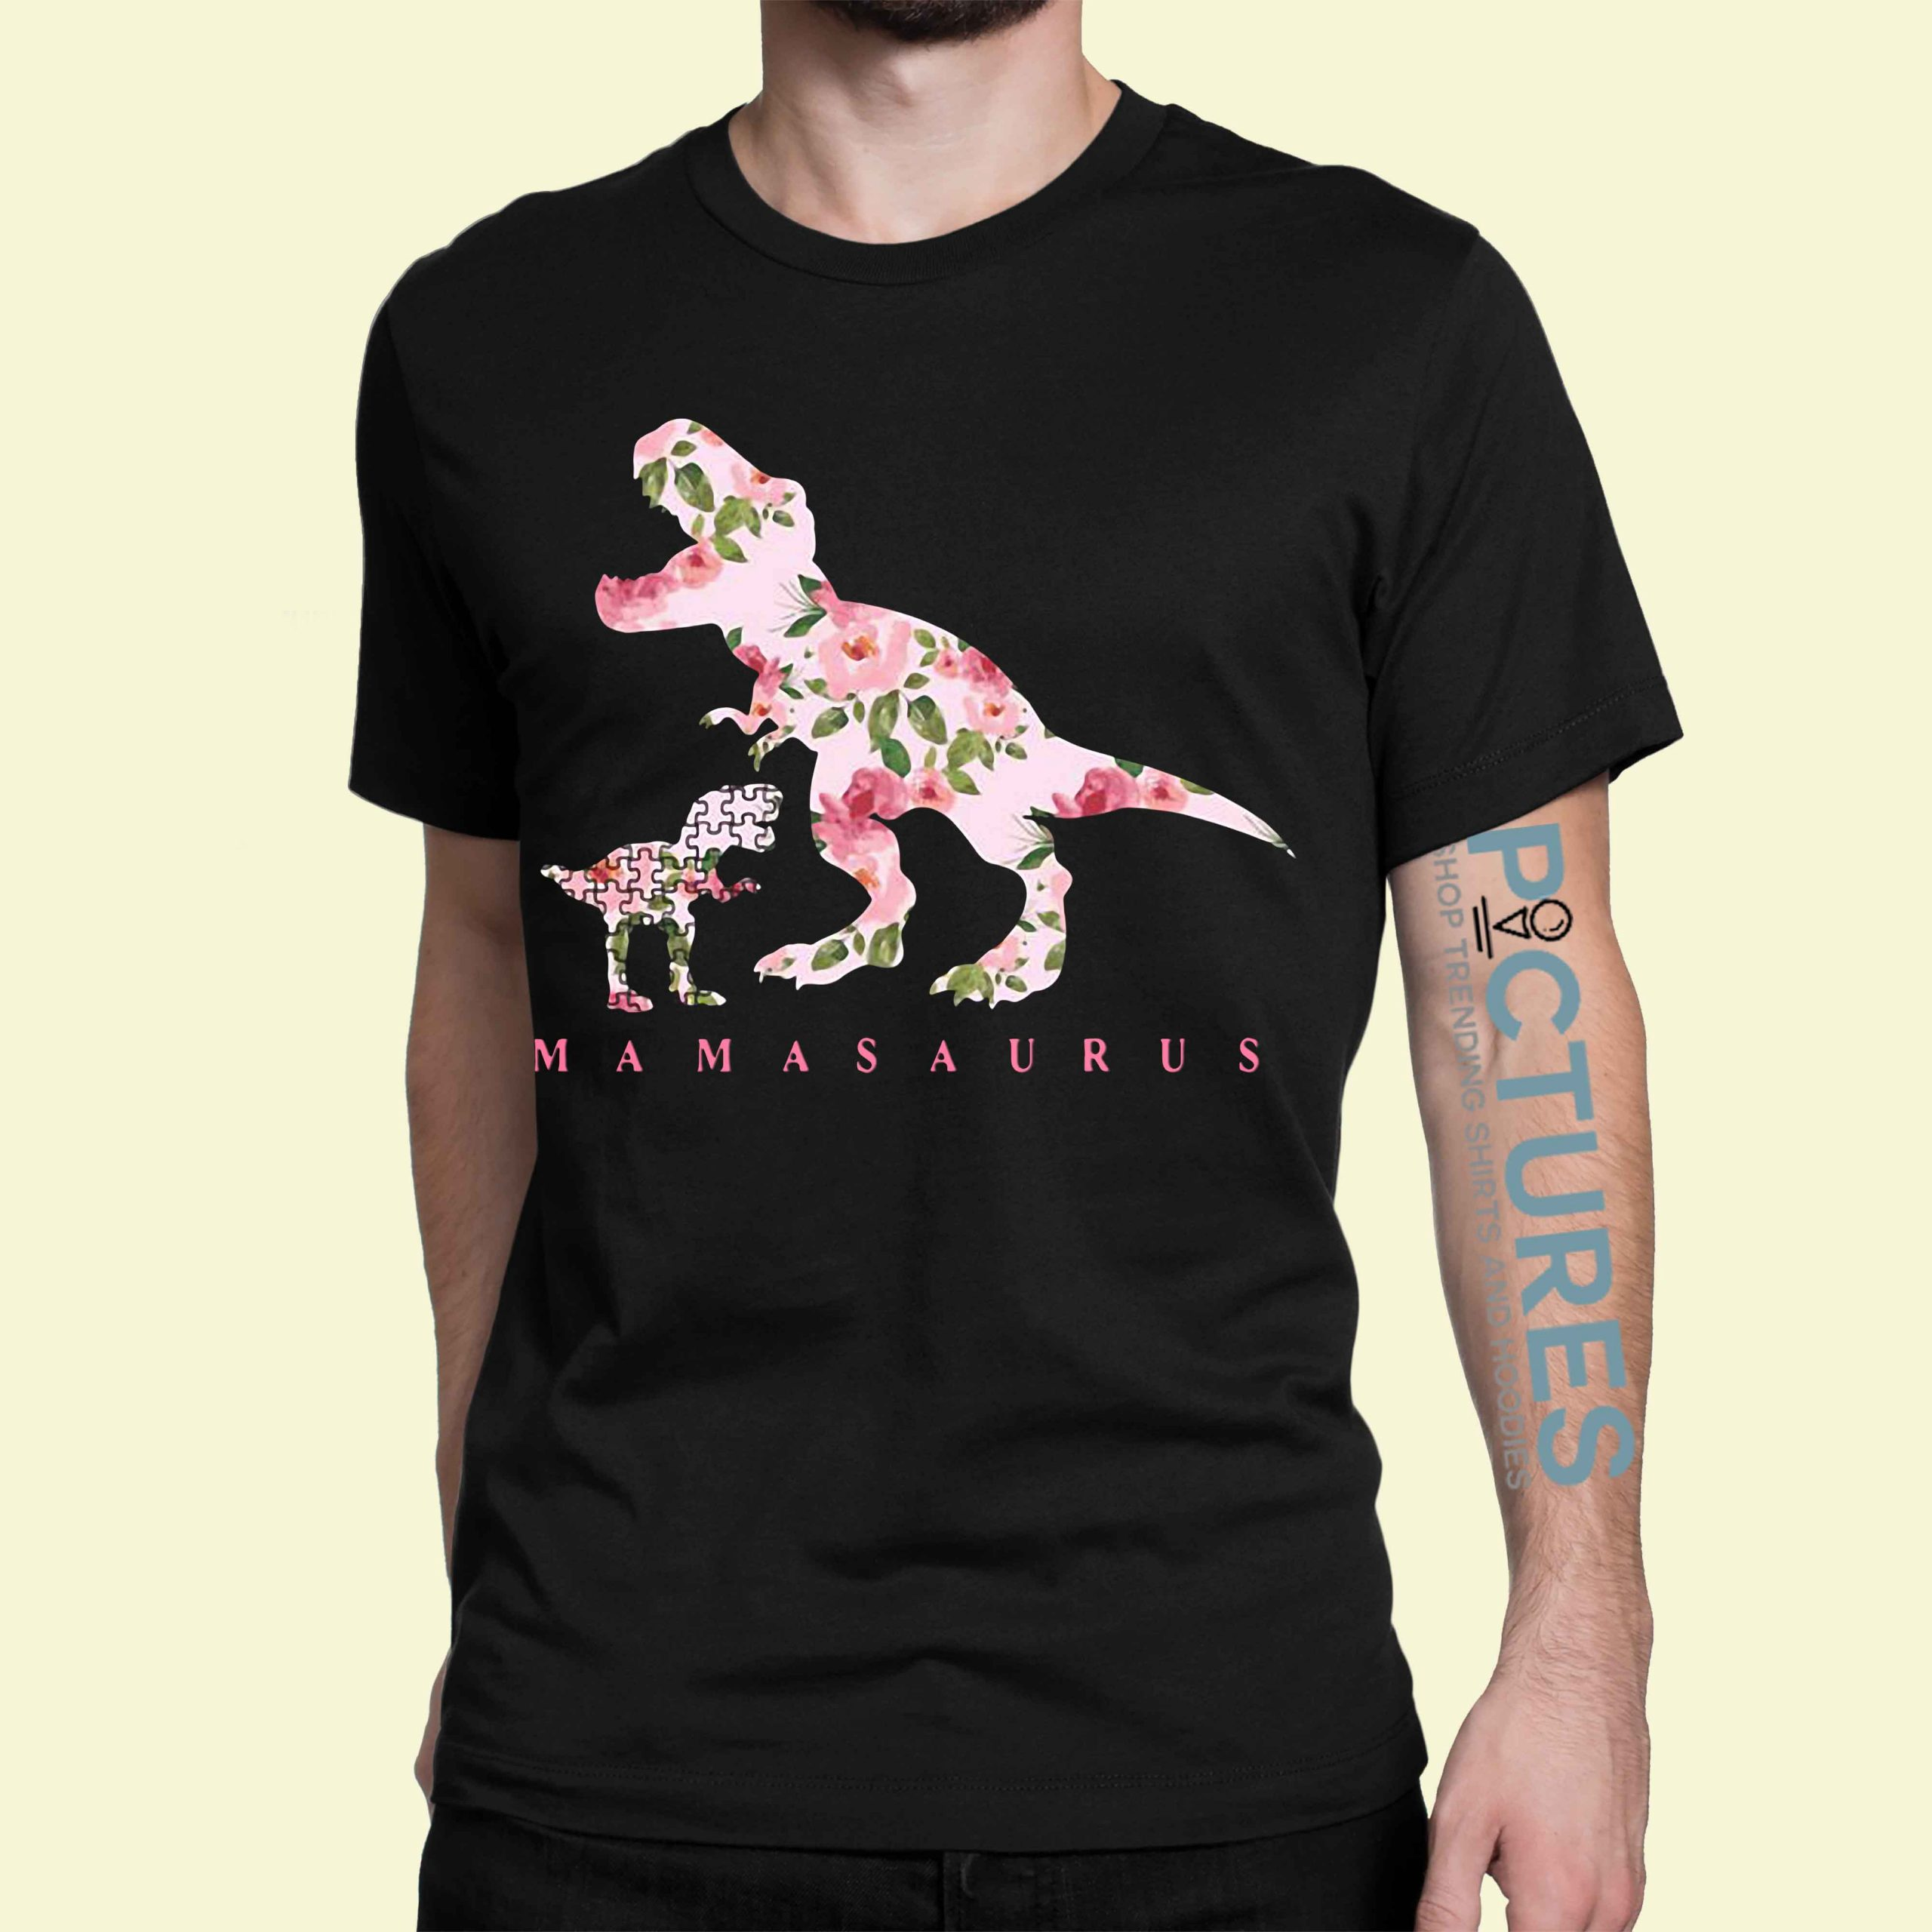 Autism Mamasaurus floral shirt